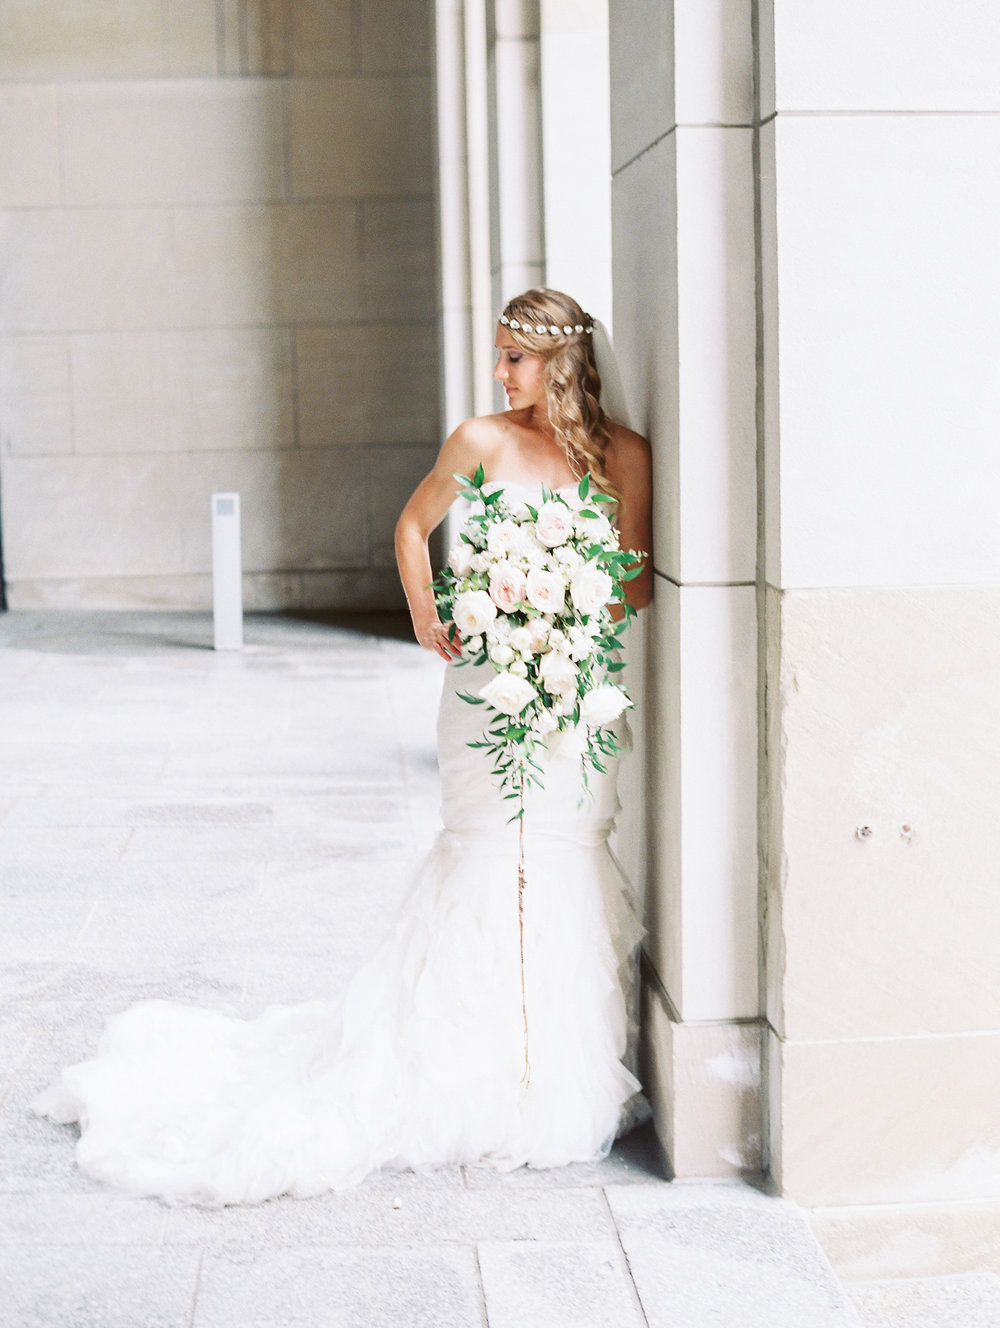 Zawisza Wedding f ASP©-32.jpg